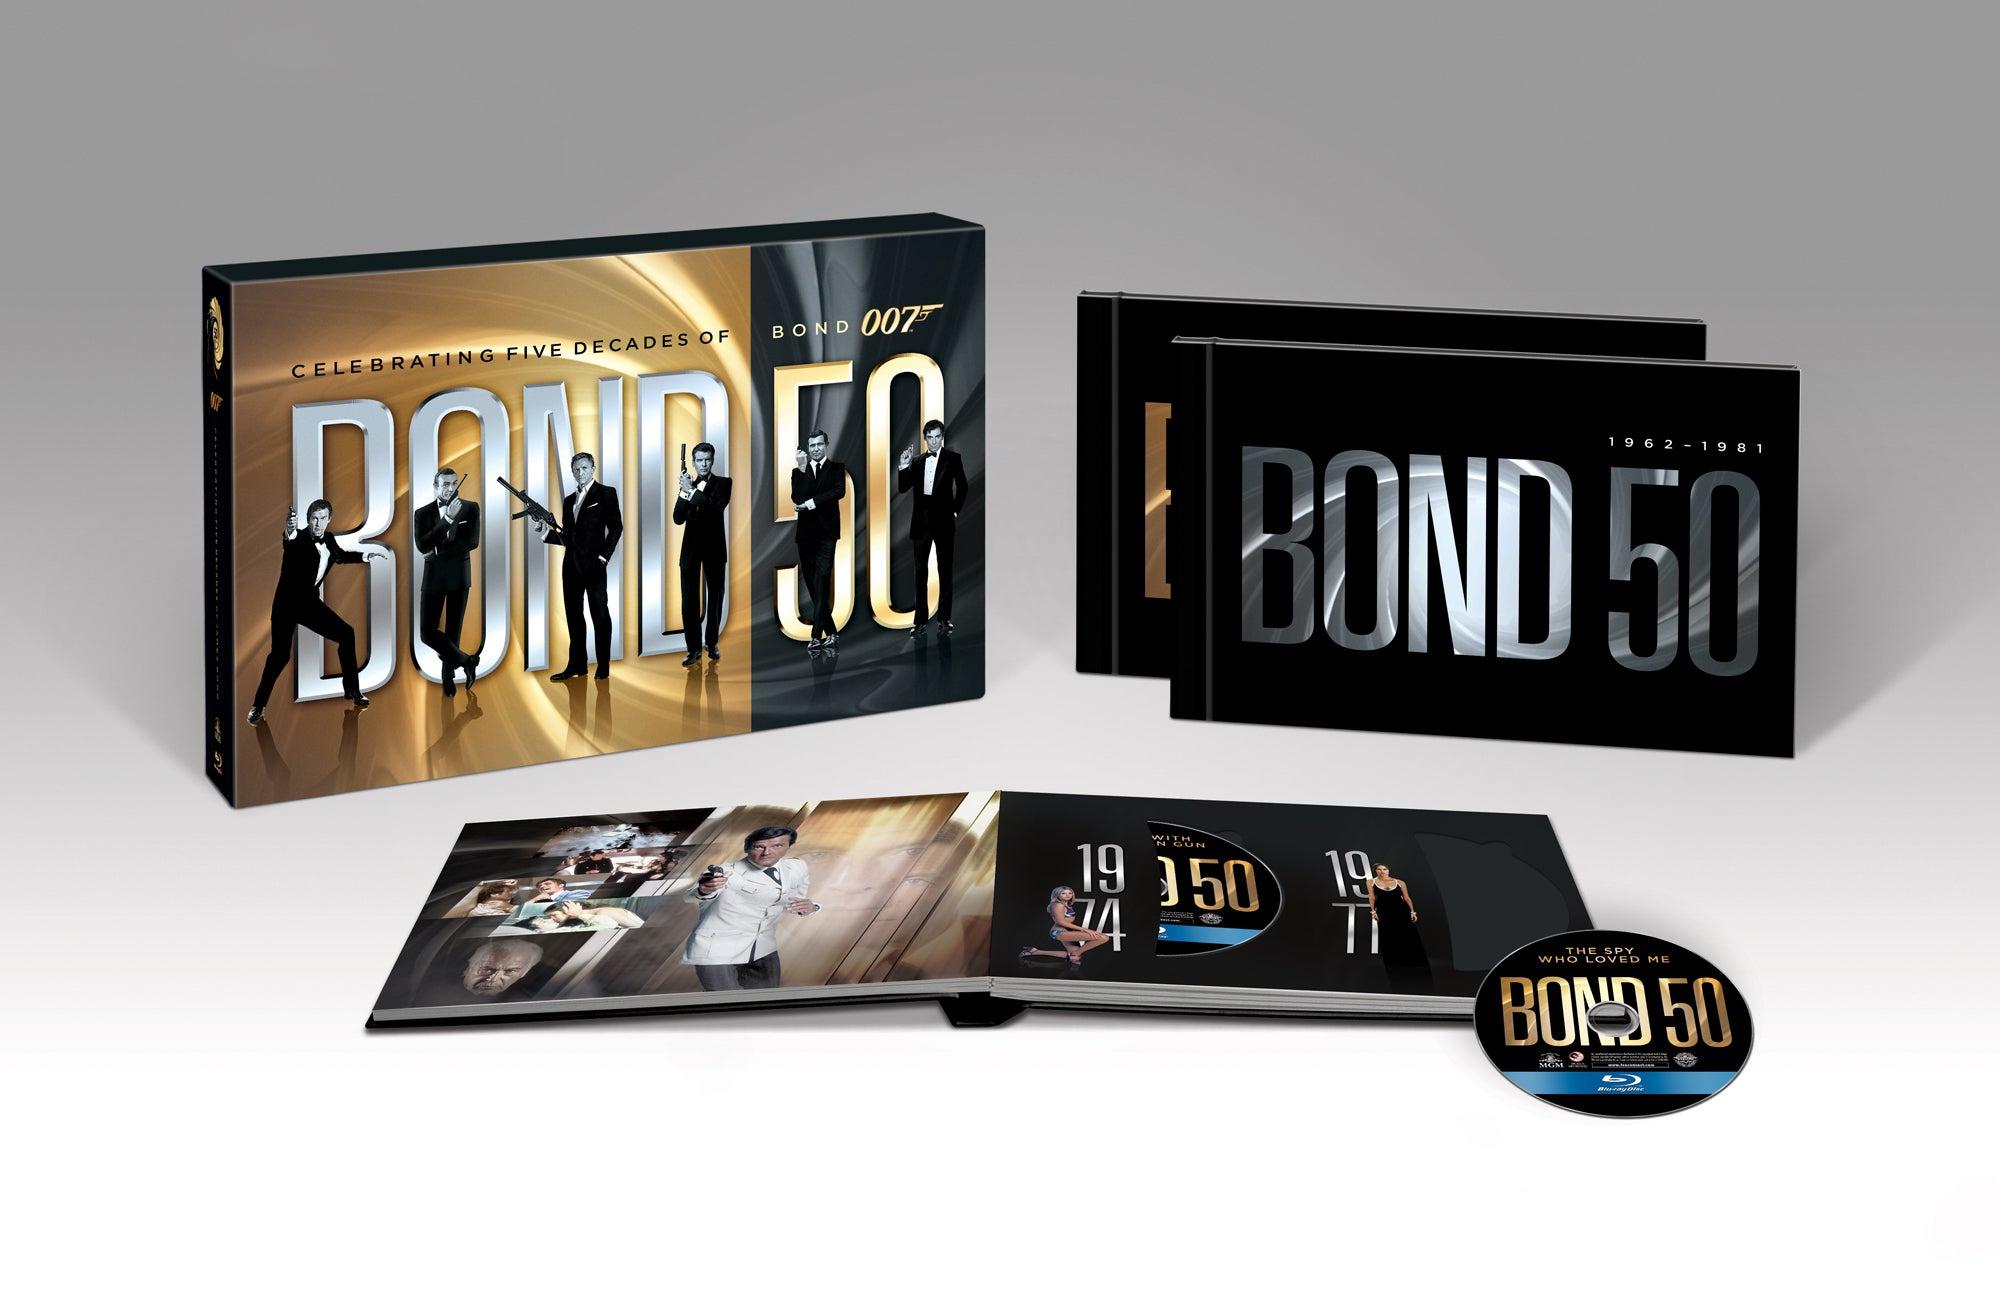 james bond 50 jaar blu ray The Official James Bond 007 Website | Bond 50 on Blu ray james bond 50 jaar blu ray